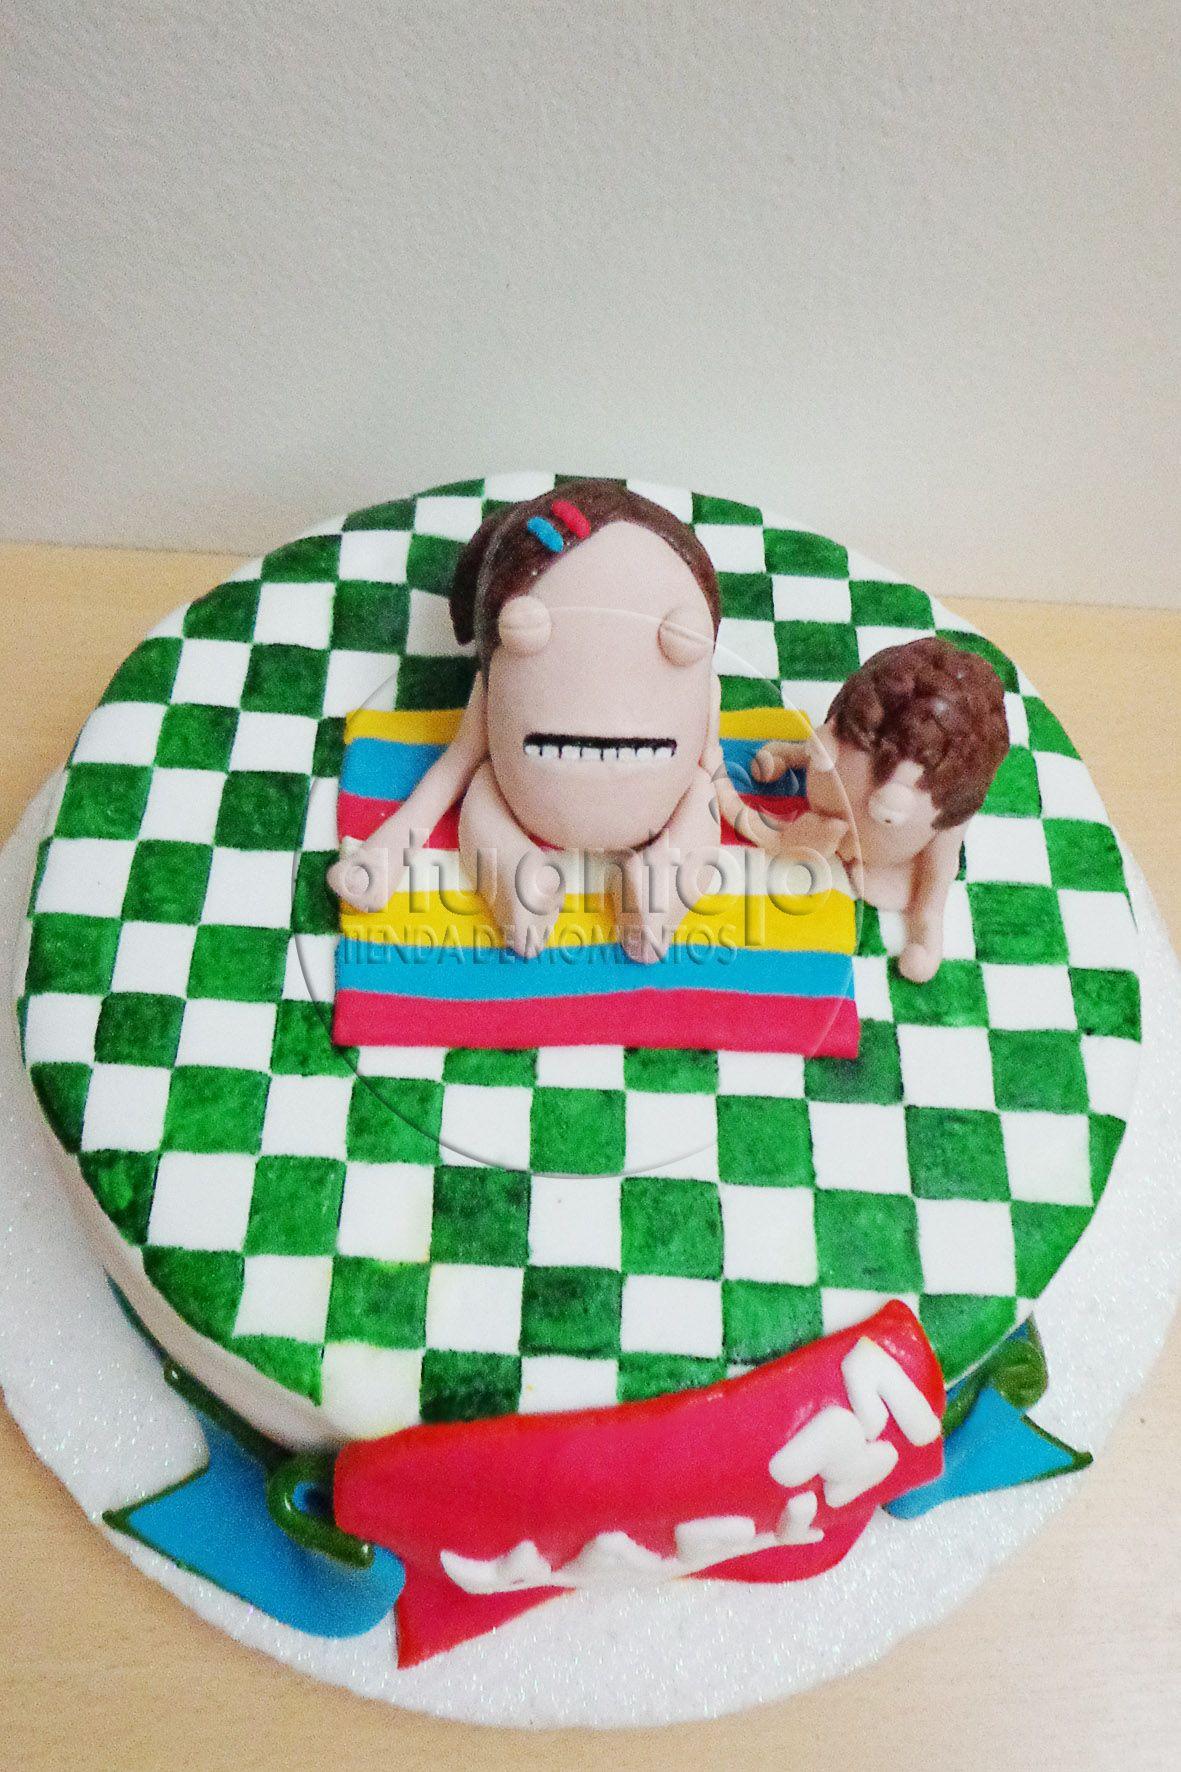 Torta Mamá Lucchetti